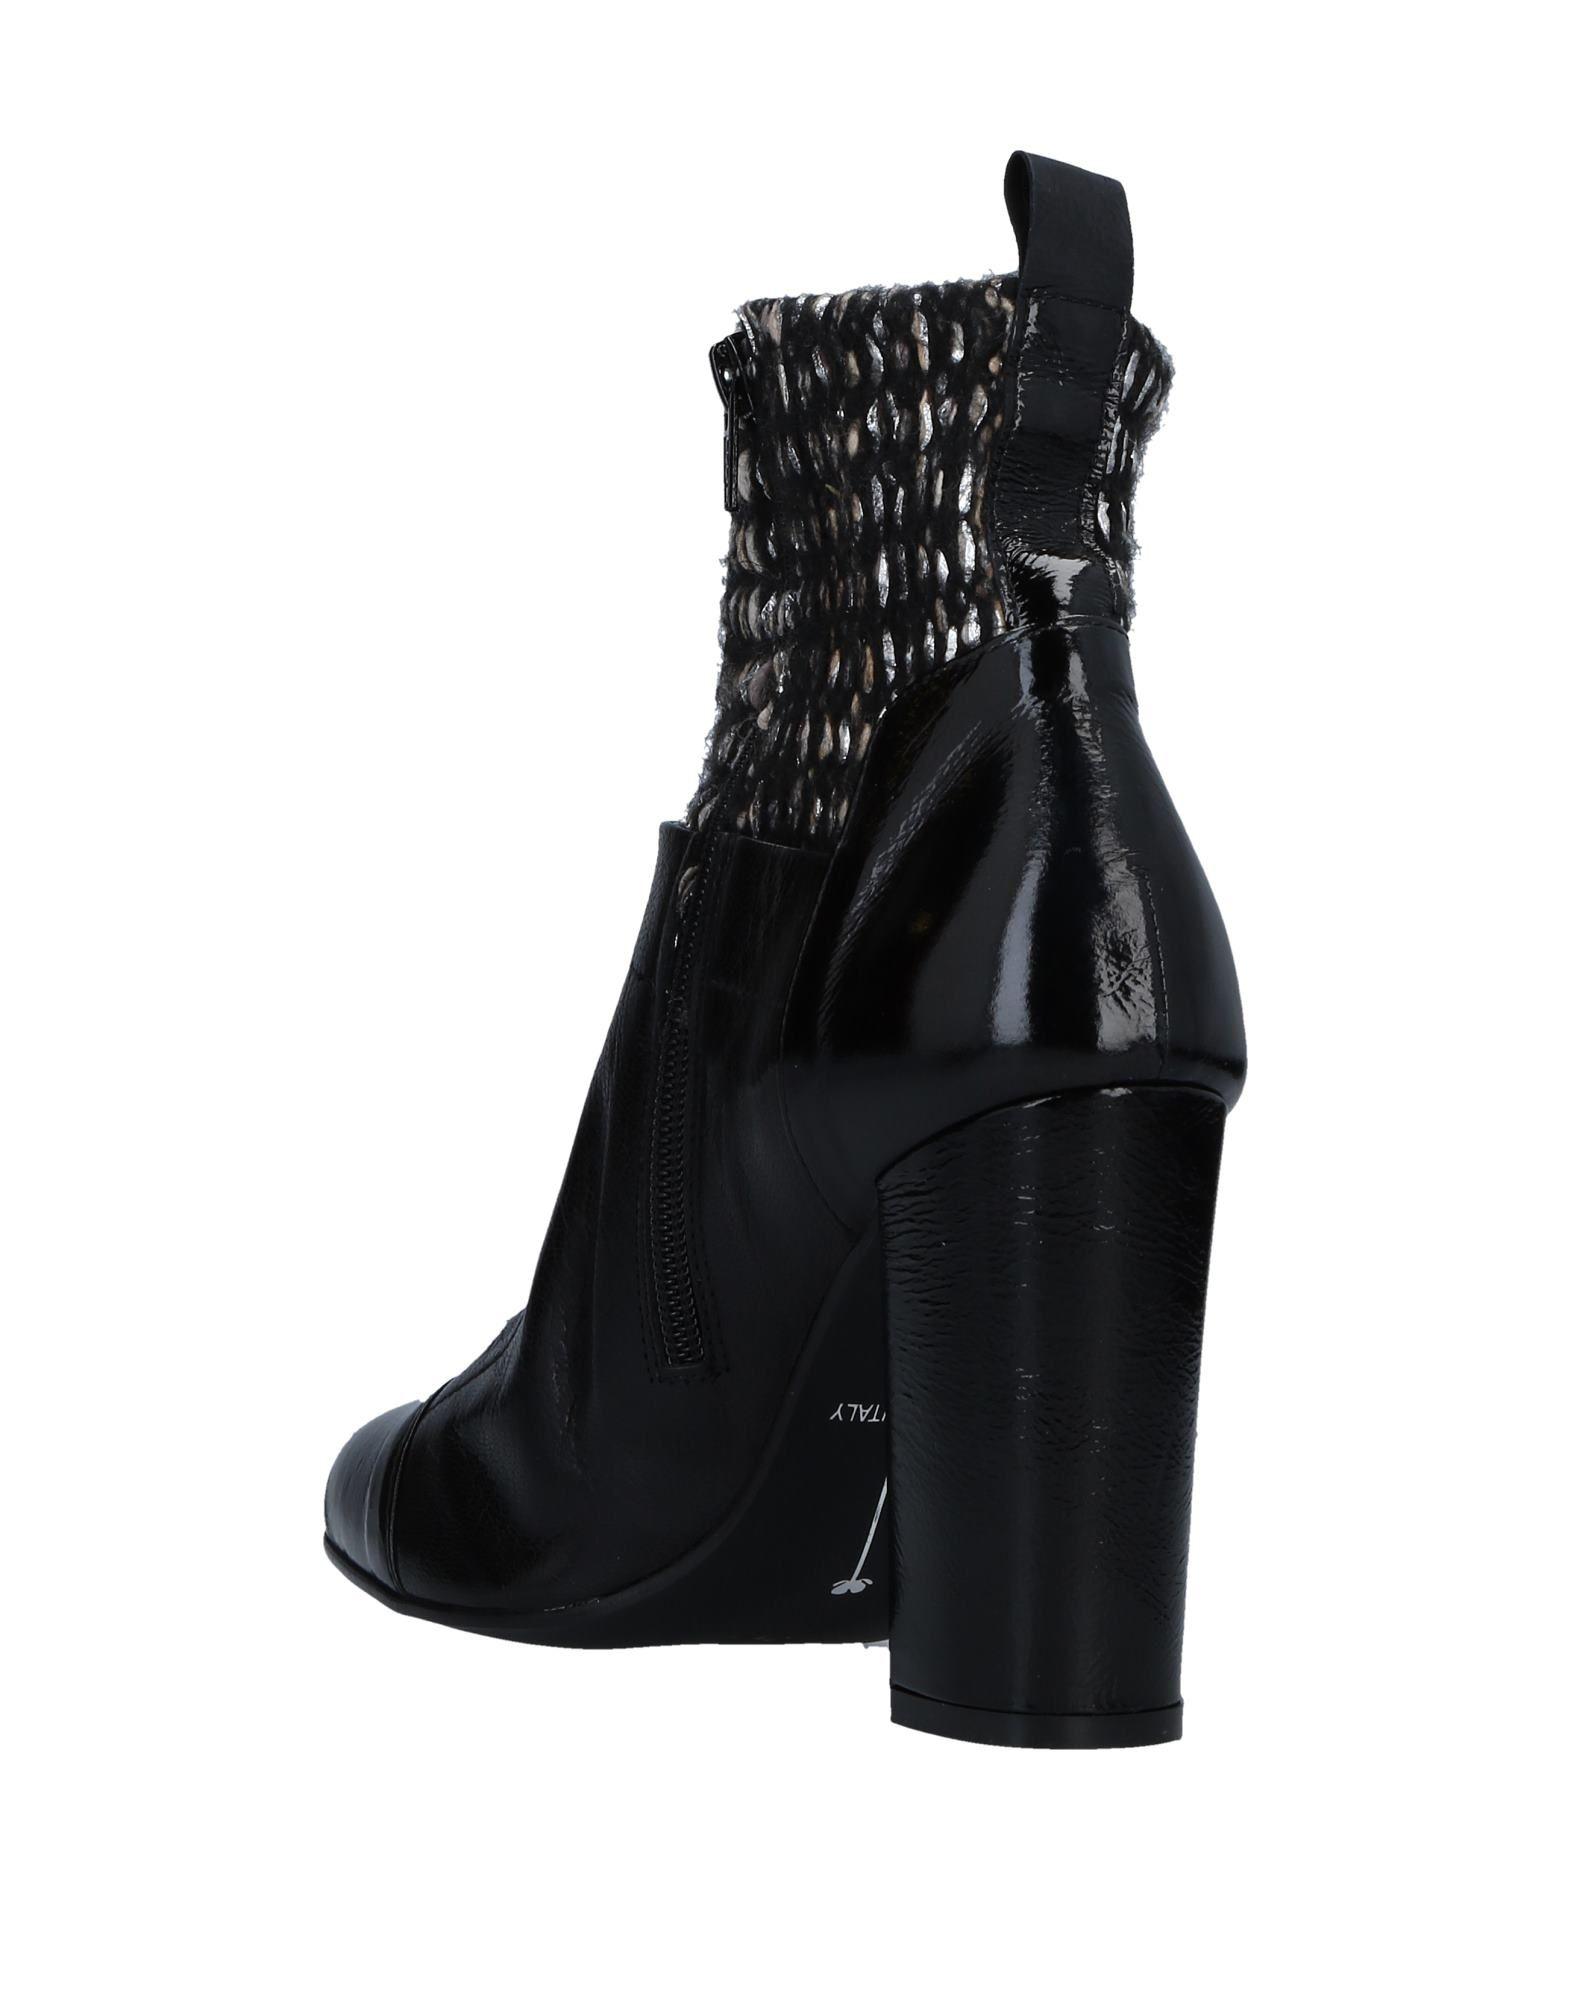 Stilvolle billige Schuhe Damen Fiorifrancesi Stiefelette Damen Schuhe  11522107LD be6601